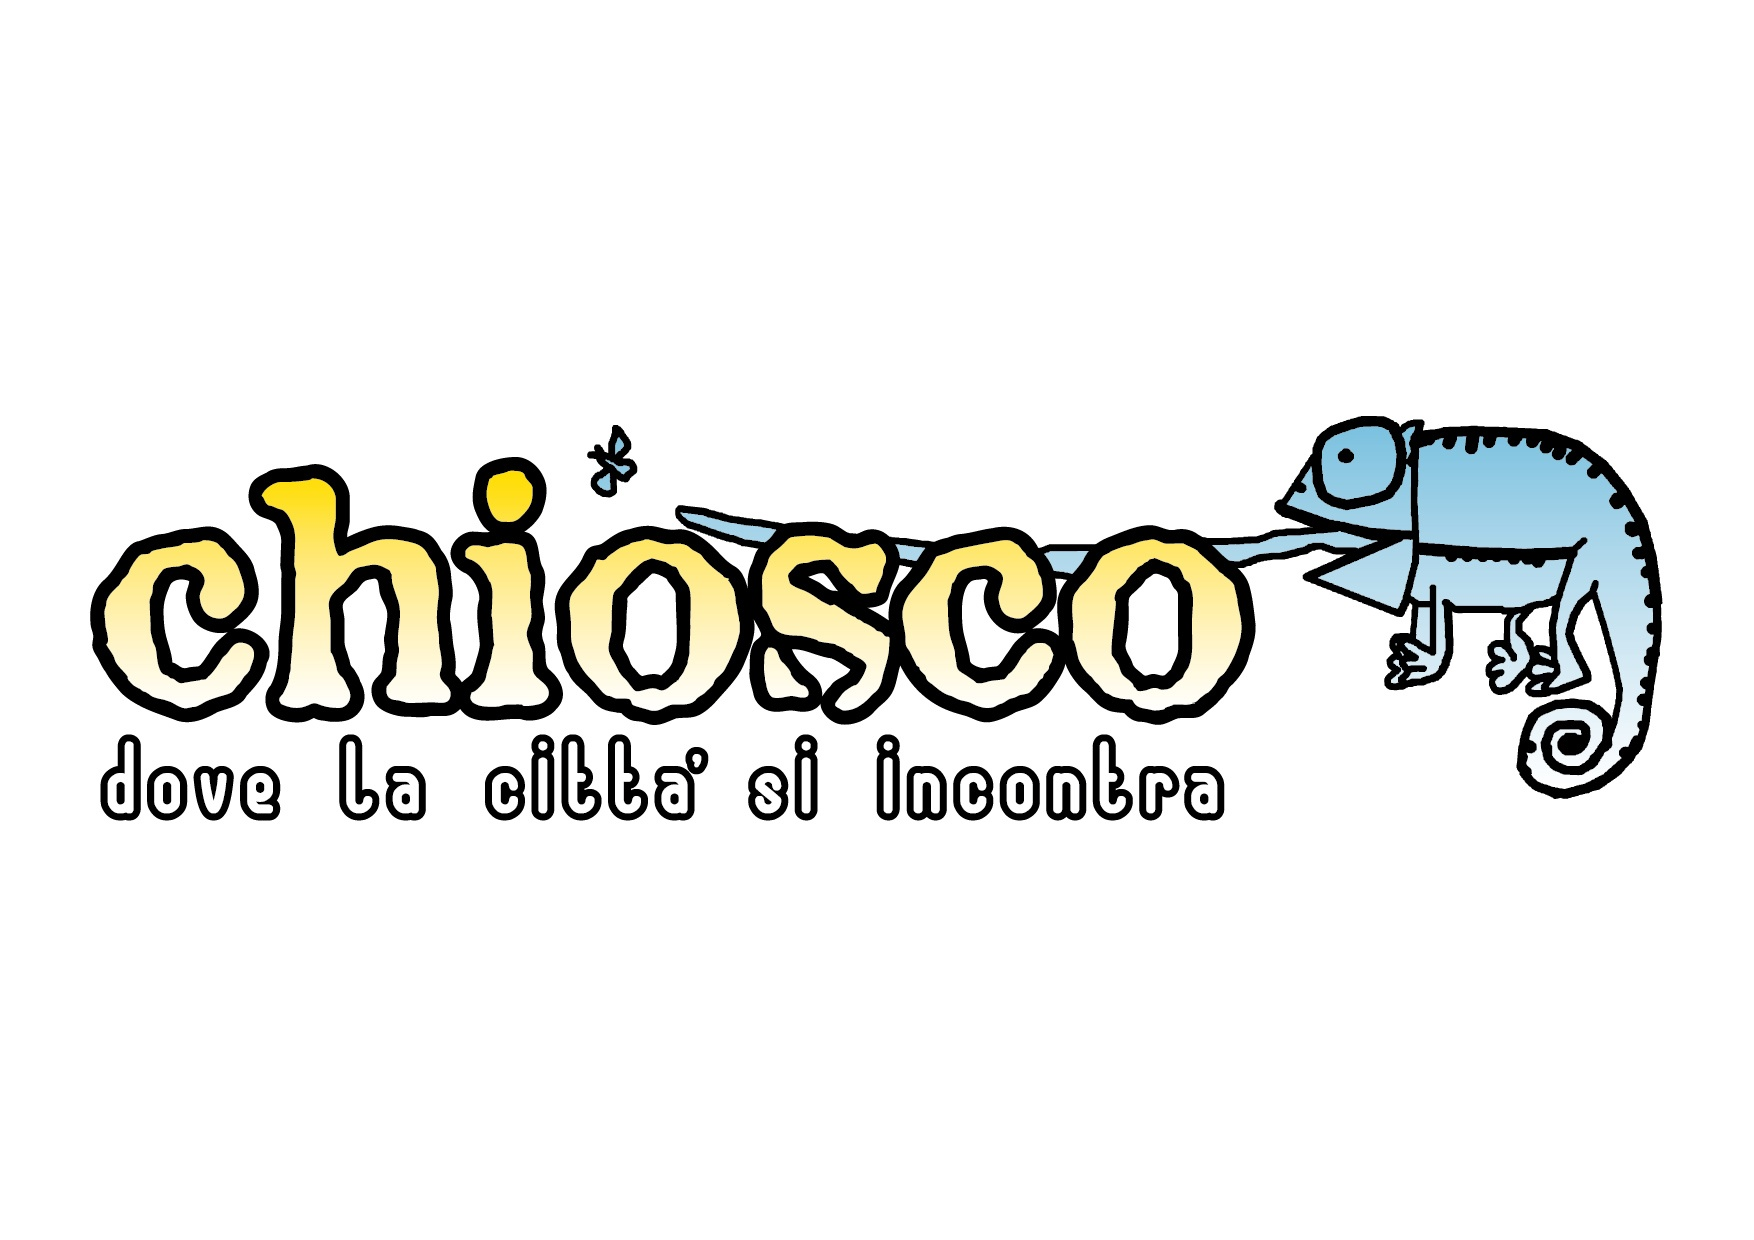 CHIOSCO